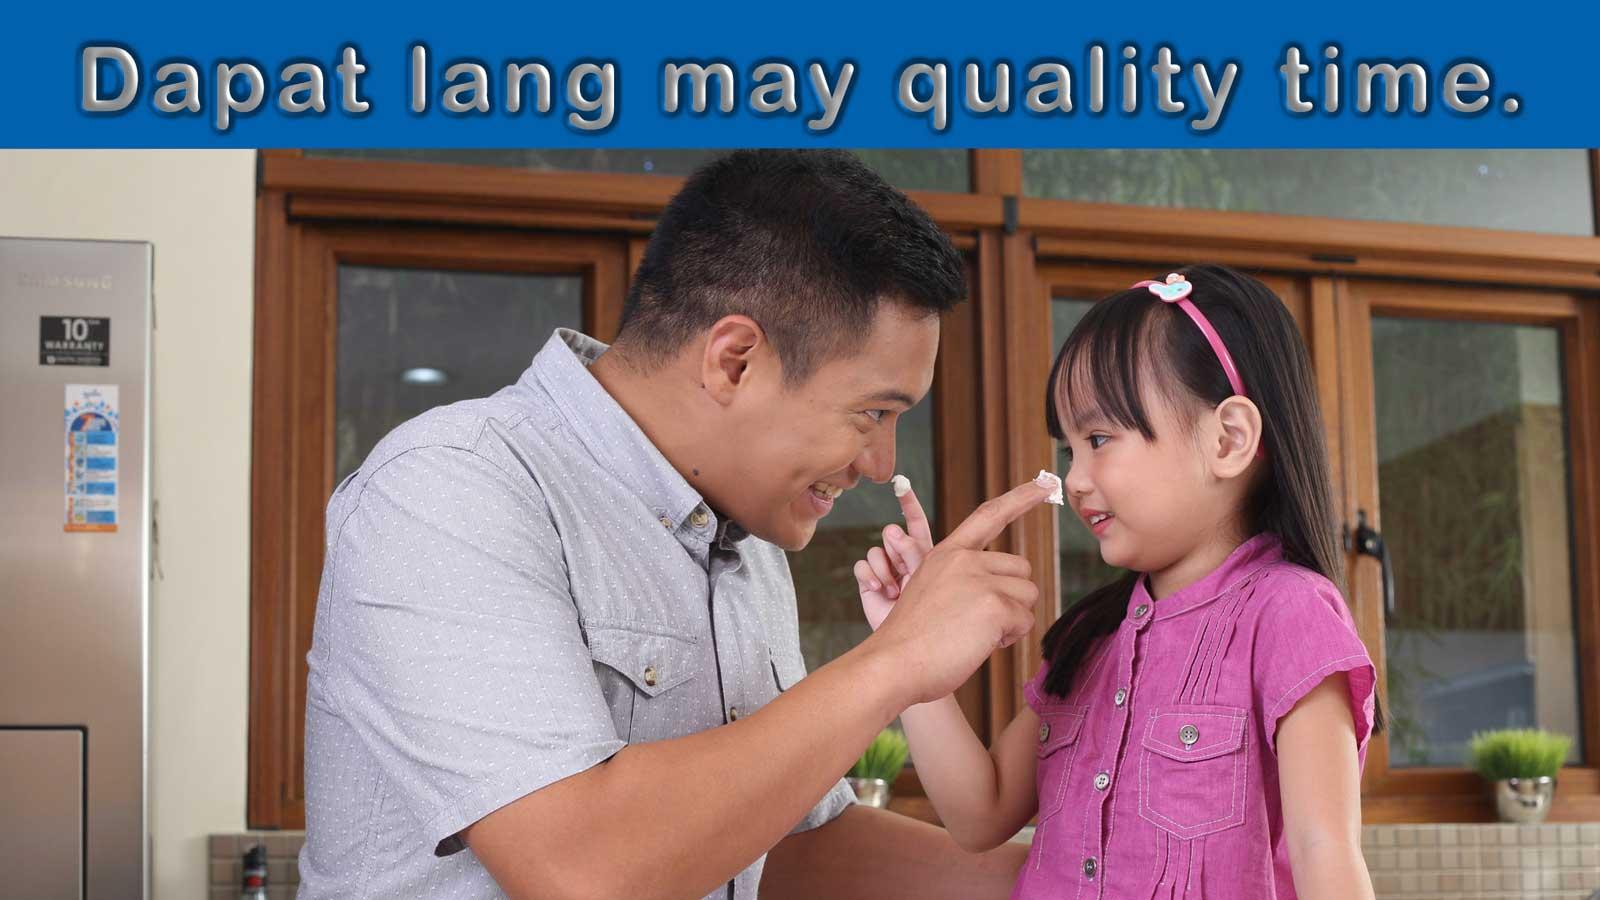 Solane promotes Filipino values